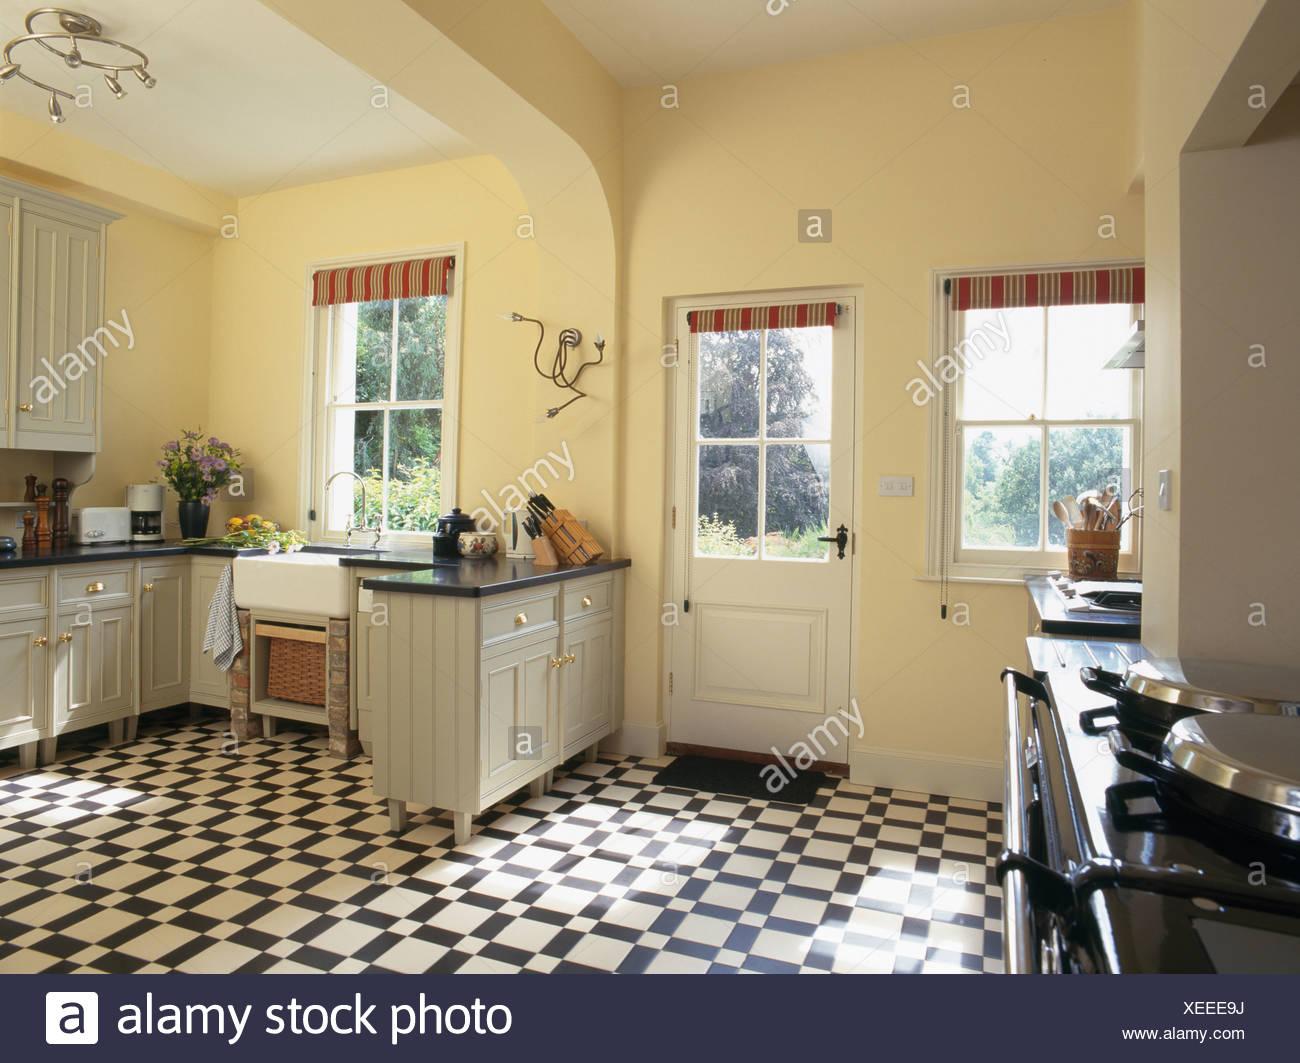 Black White Vinyl Flooring In Pastel Yellow Country Kitchen Stock Photo Alamy